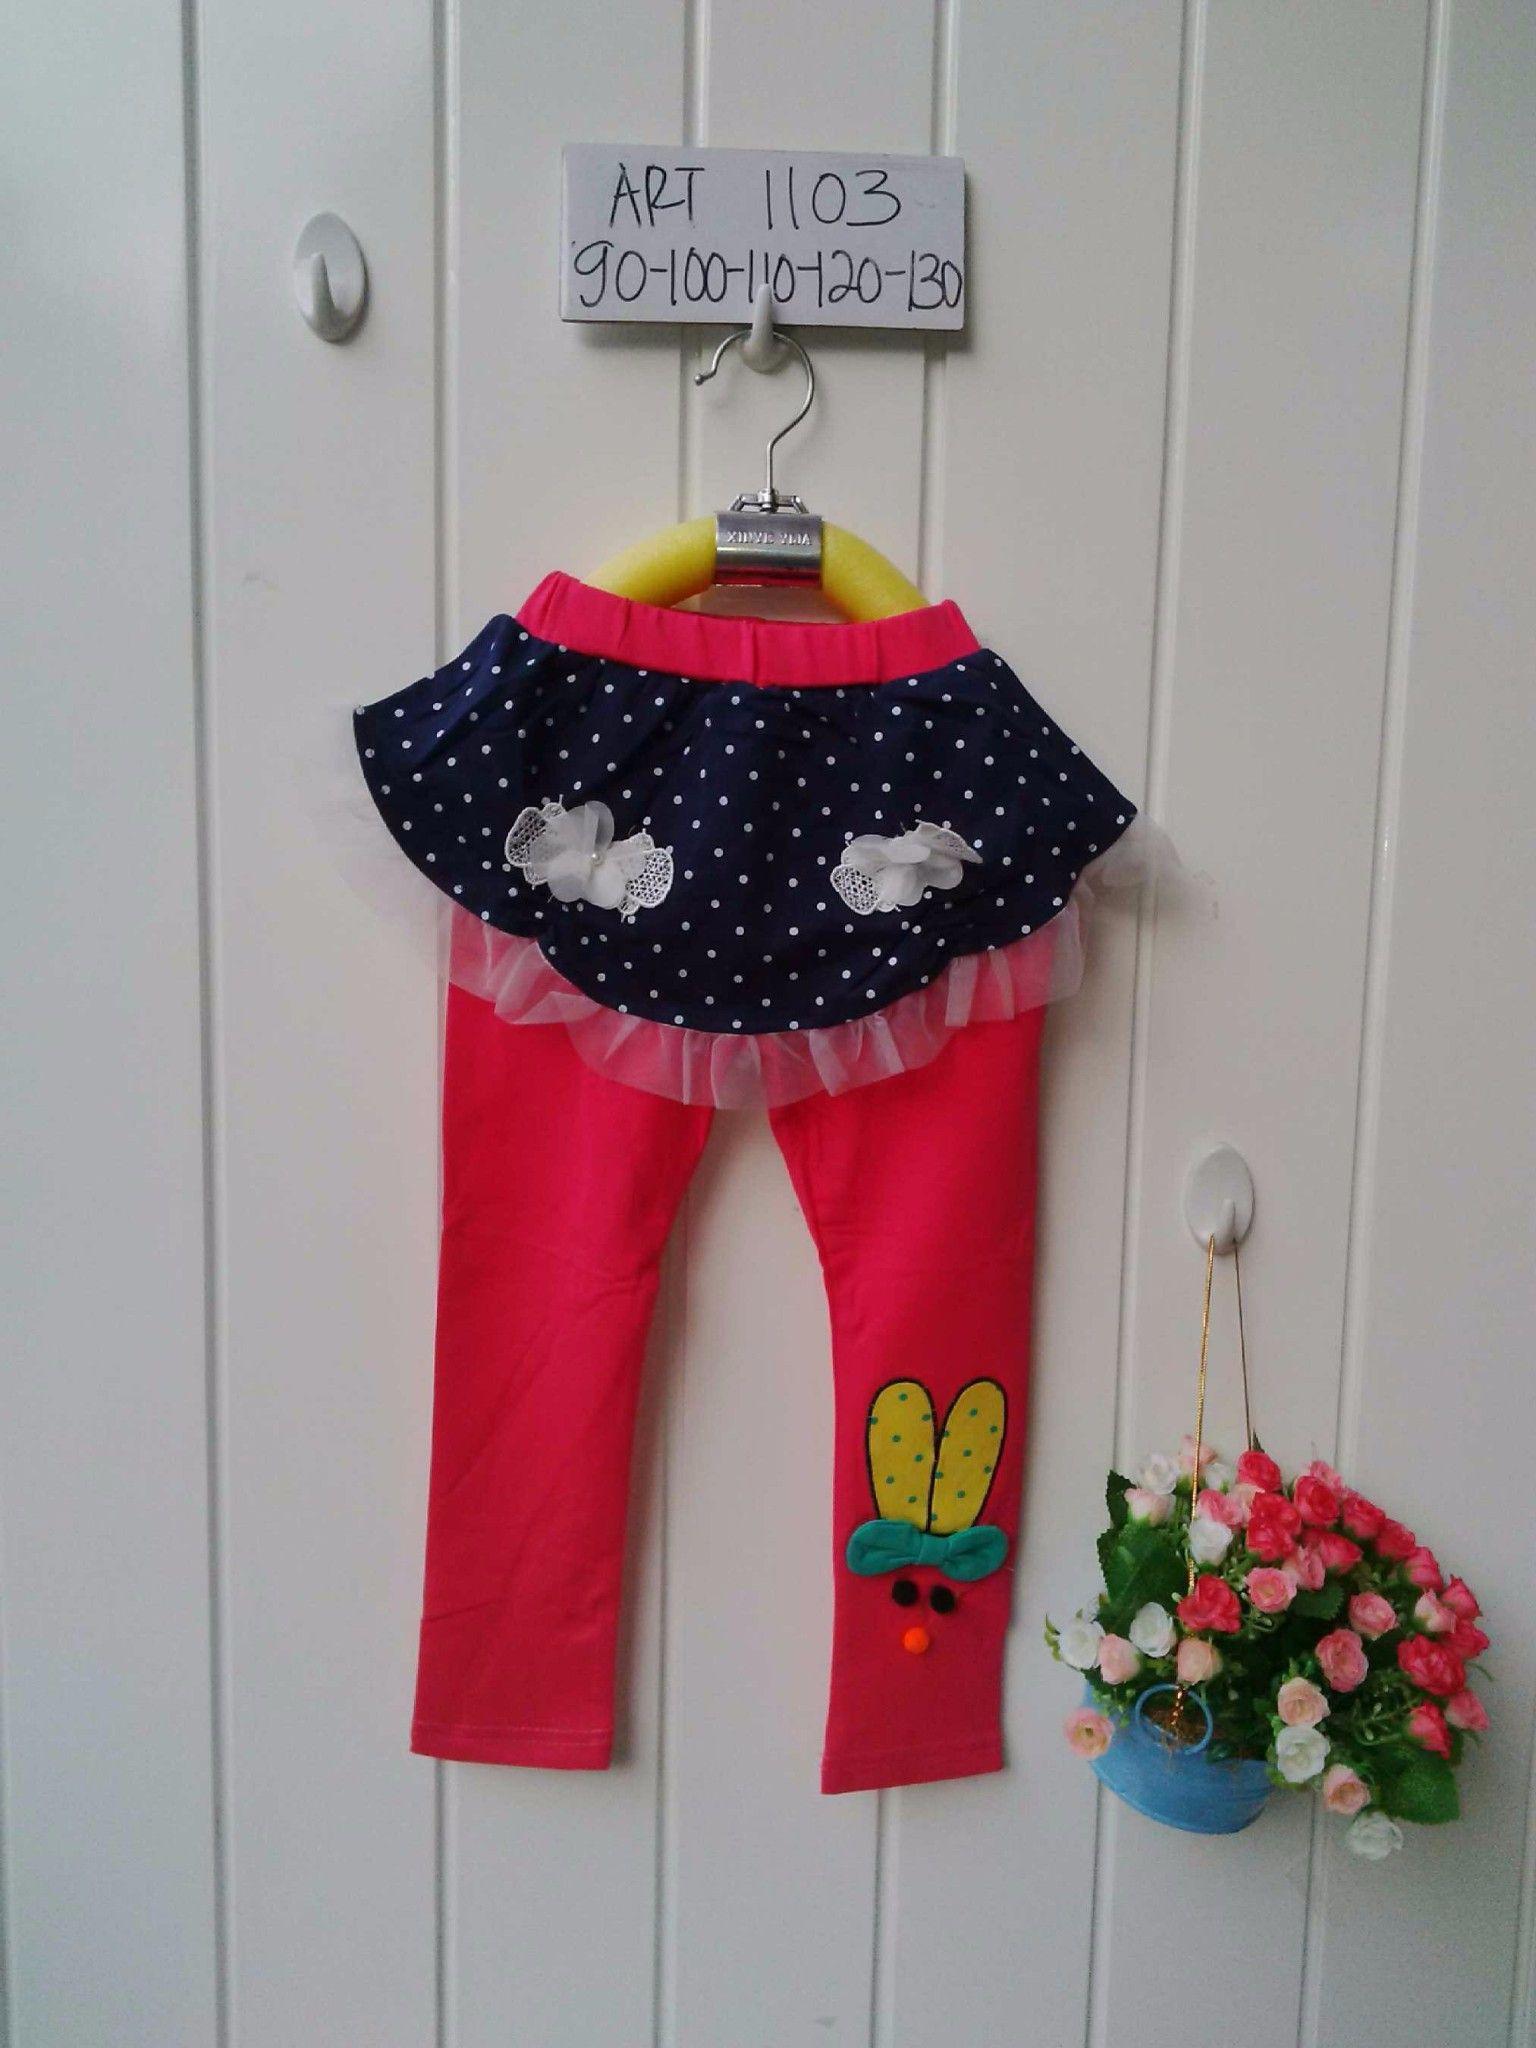 Legging Rok Pita ART1103 Adora Baby Shop Baju bayi